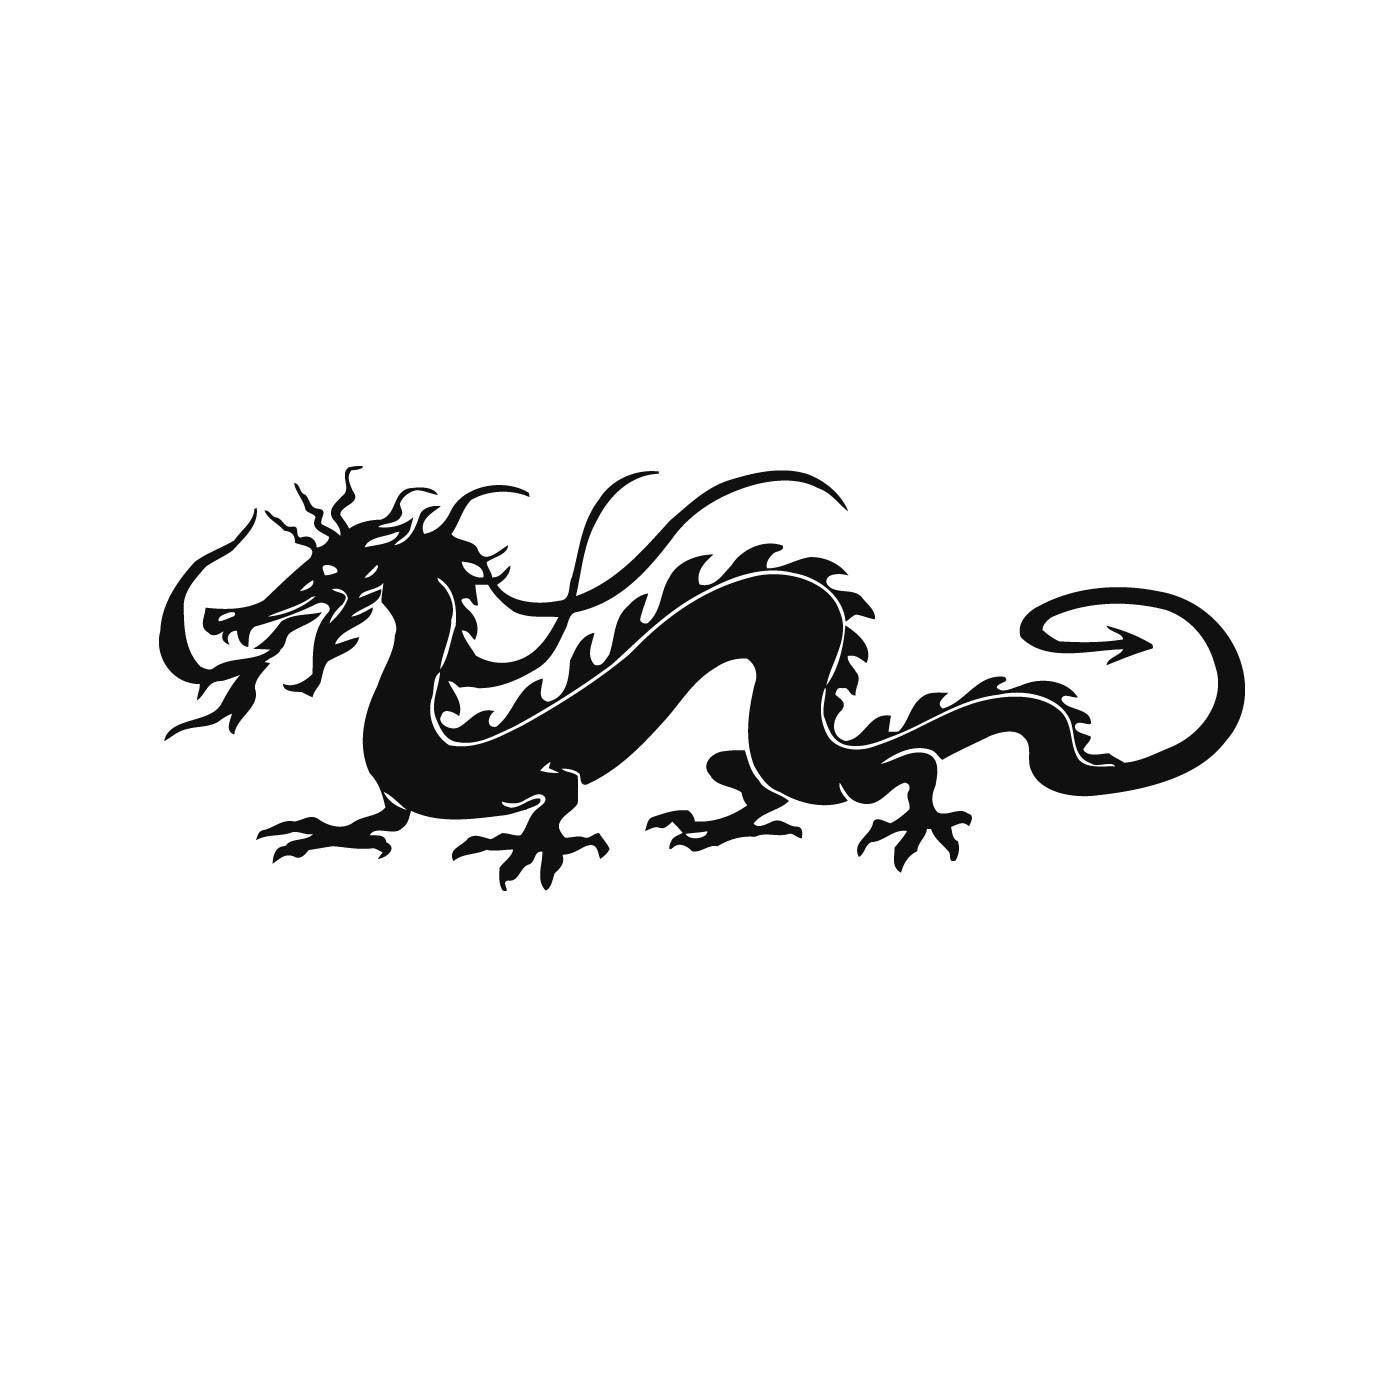 Китайские драконы картинка трафарет